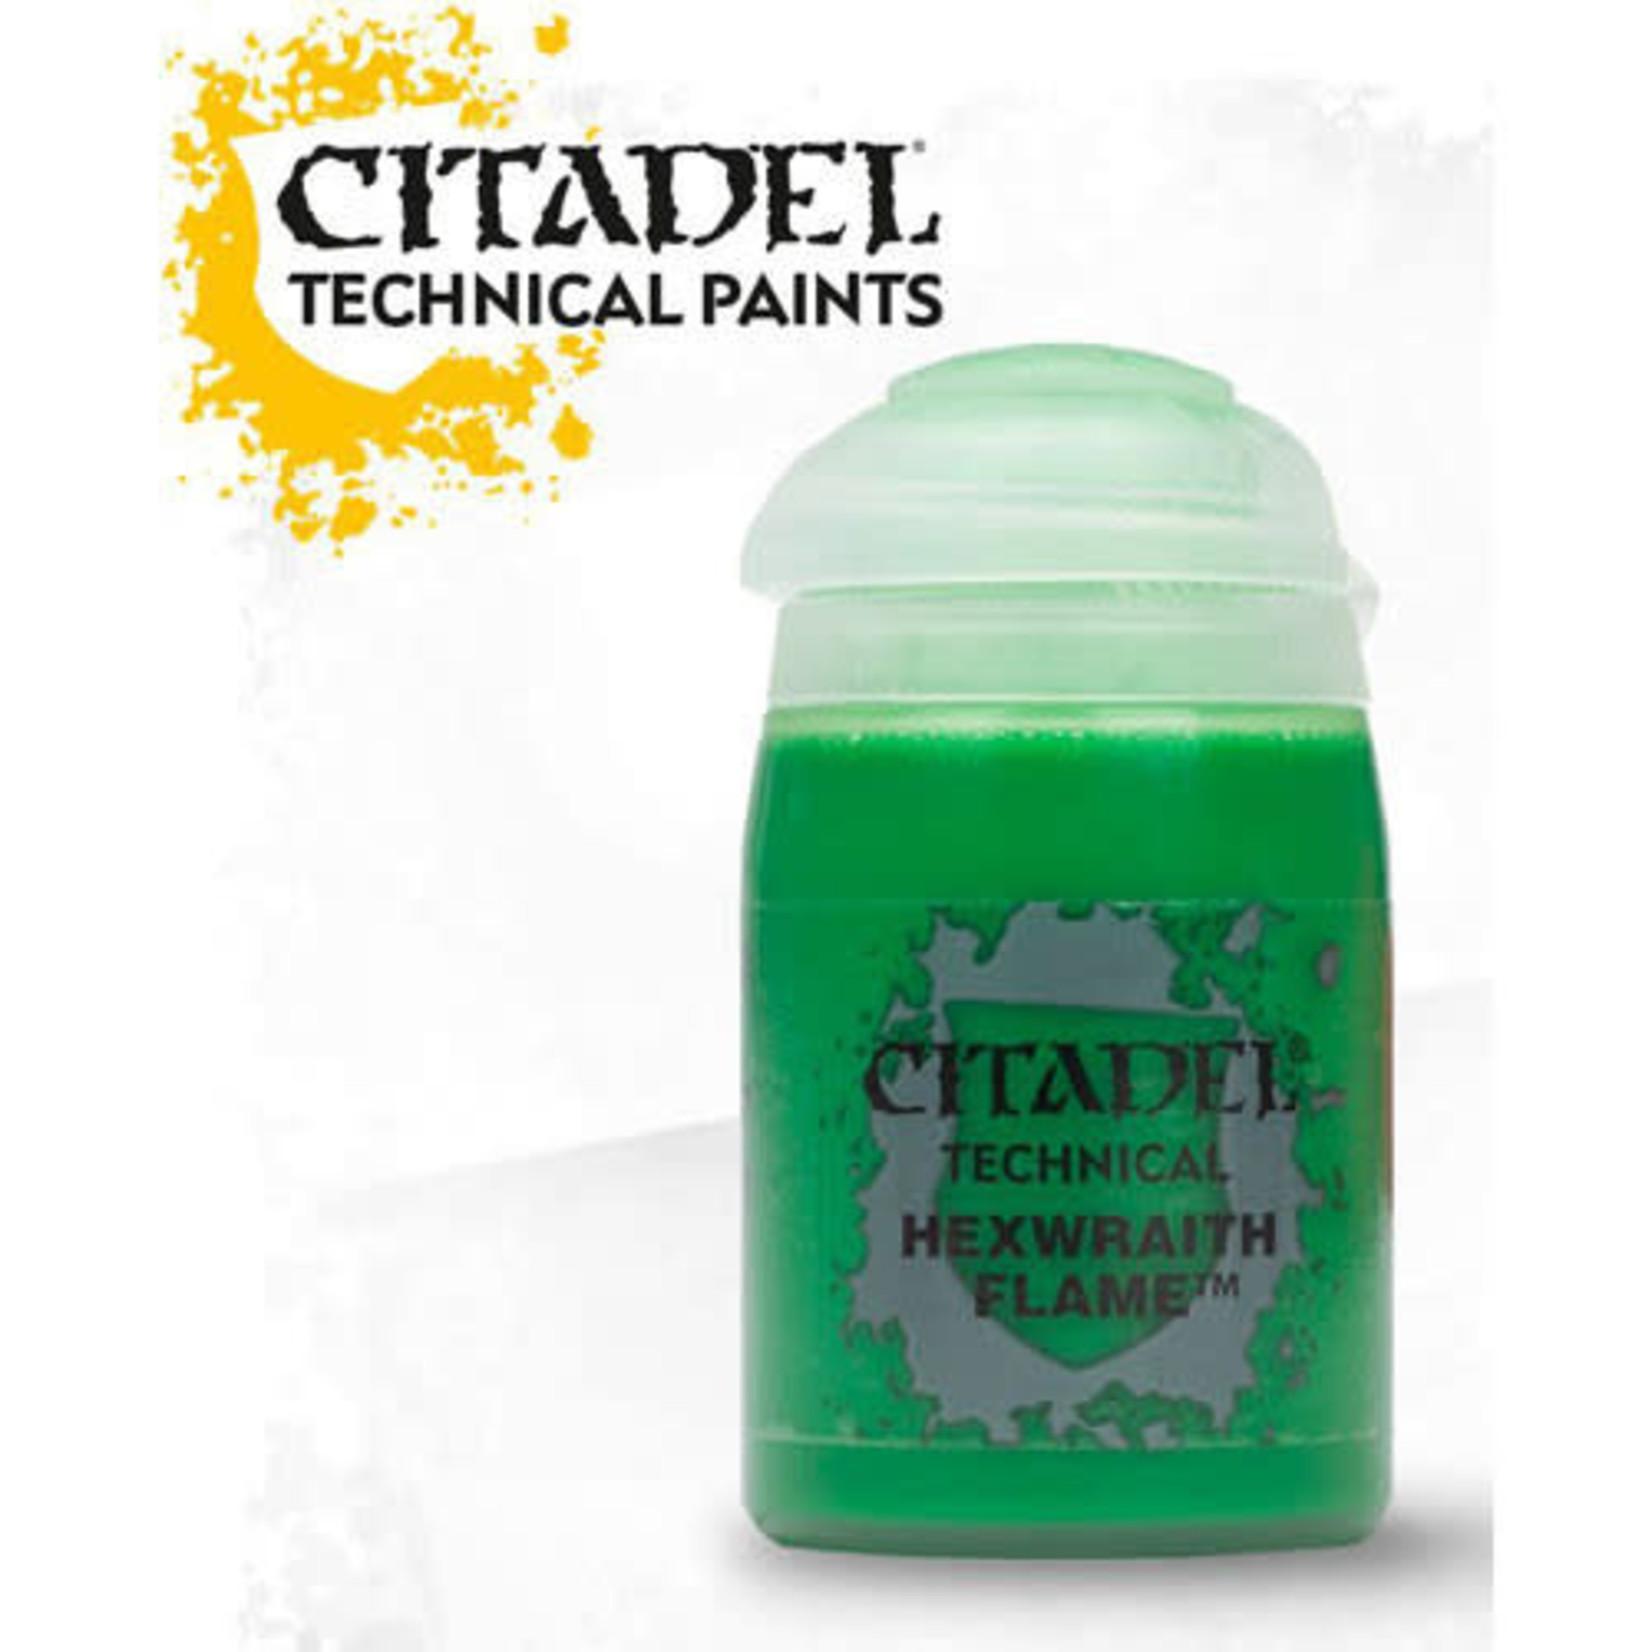 Citadel Citadel Paint - Technical: Hexwraith Flame